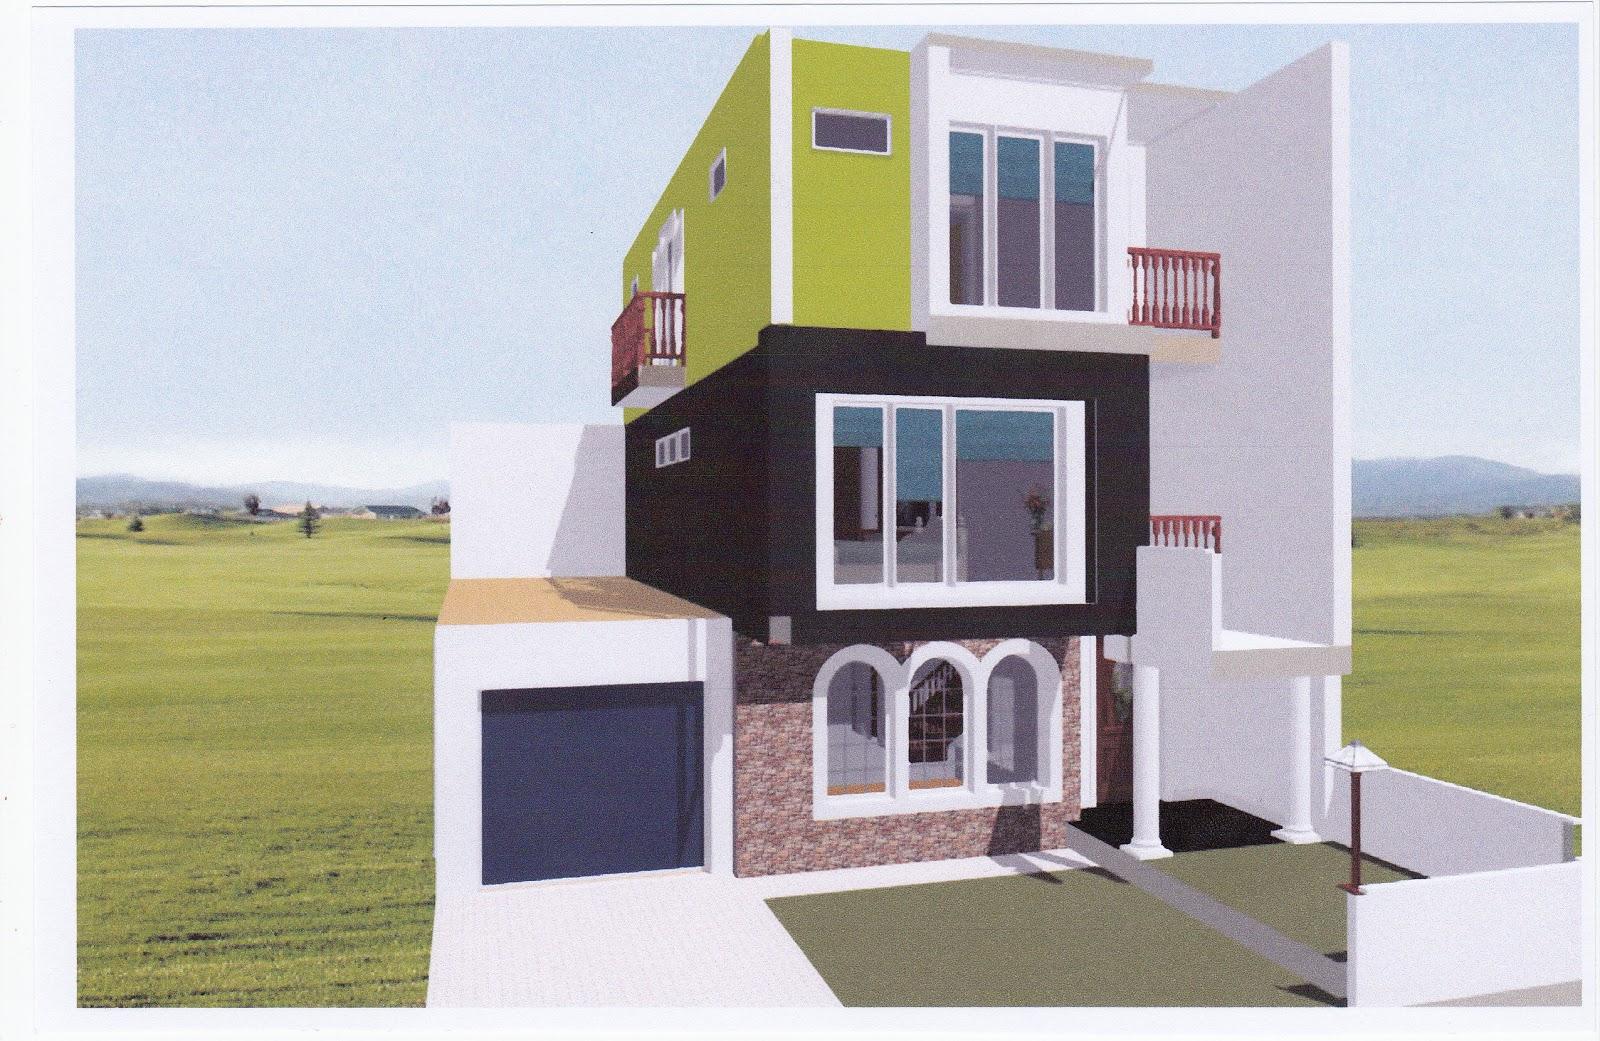 free home designer home design expert home design experts home and landscaping design